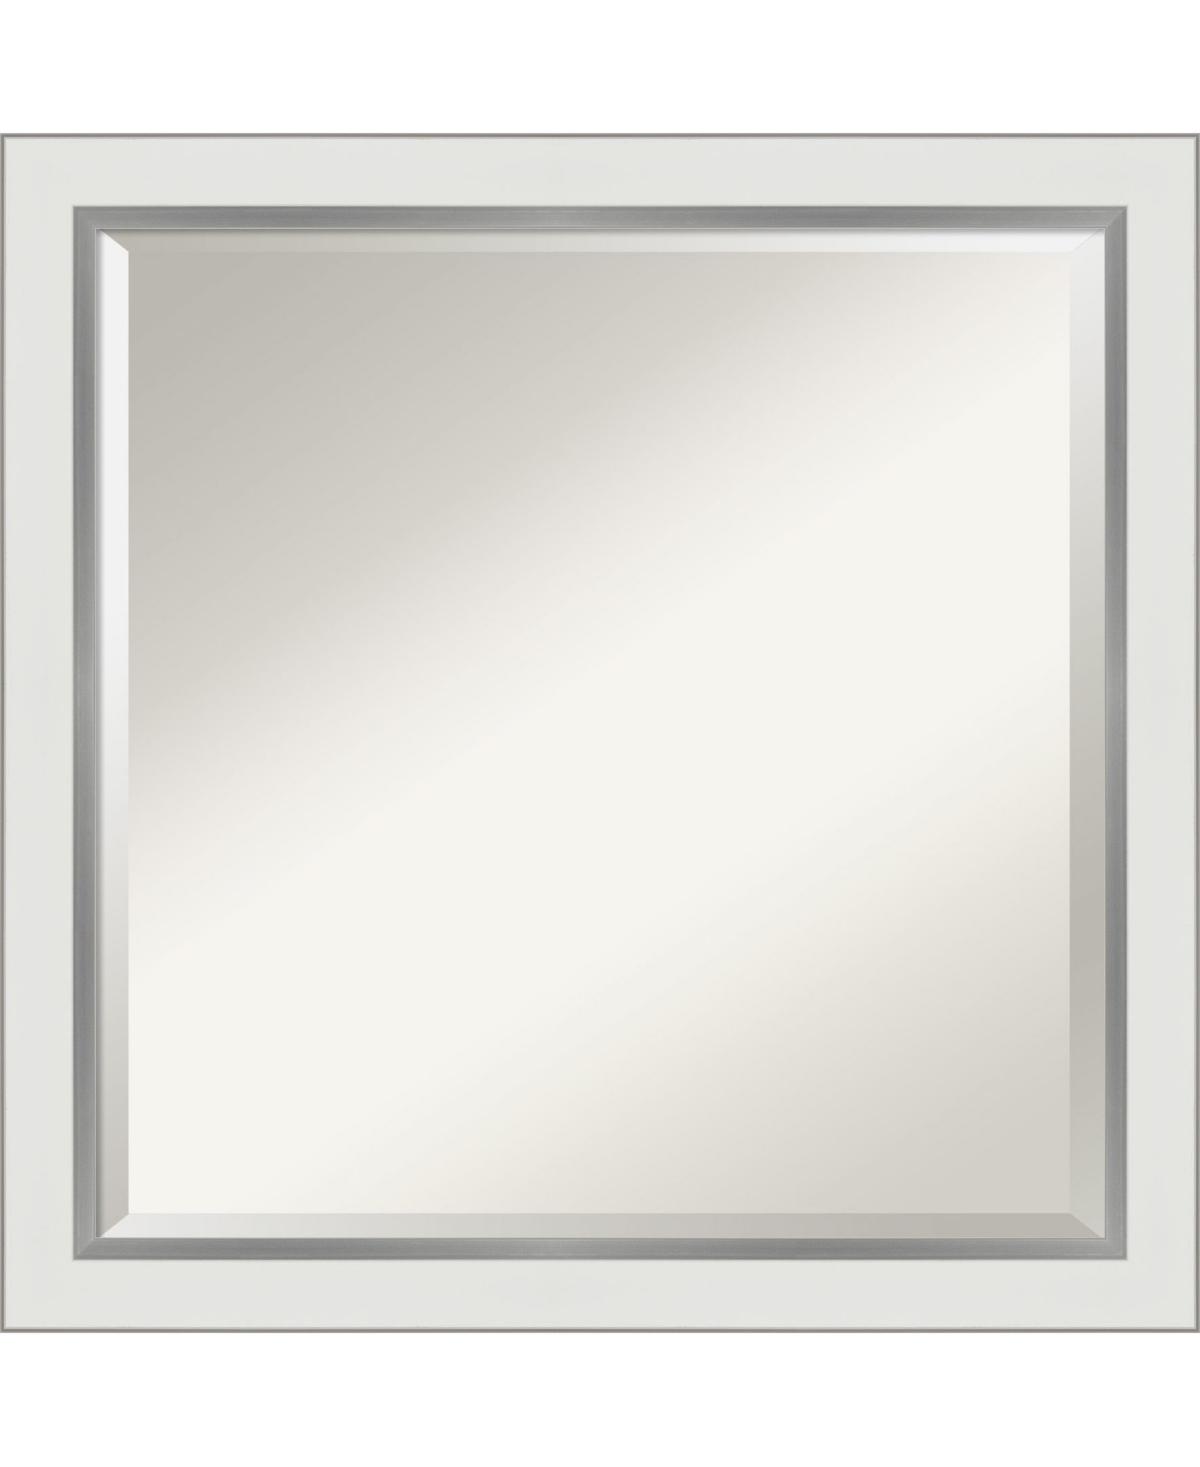 Amanti Art Eva Silver-tone Framed Bathroom Vanity Wall Mirror, 23.12